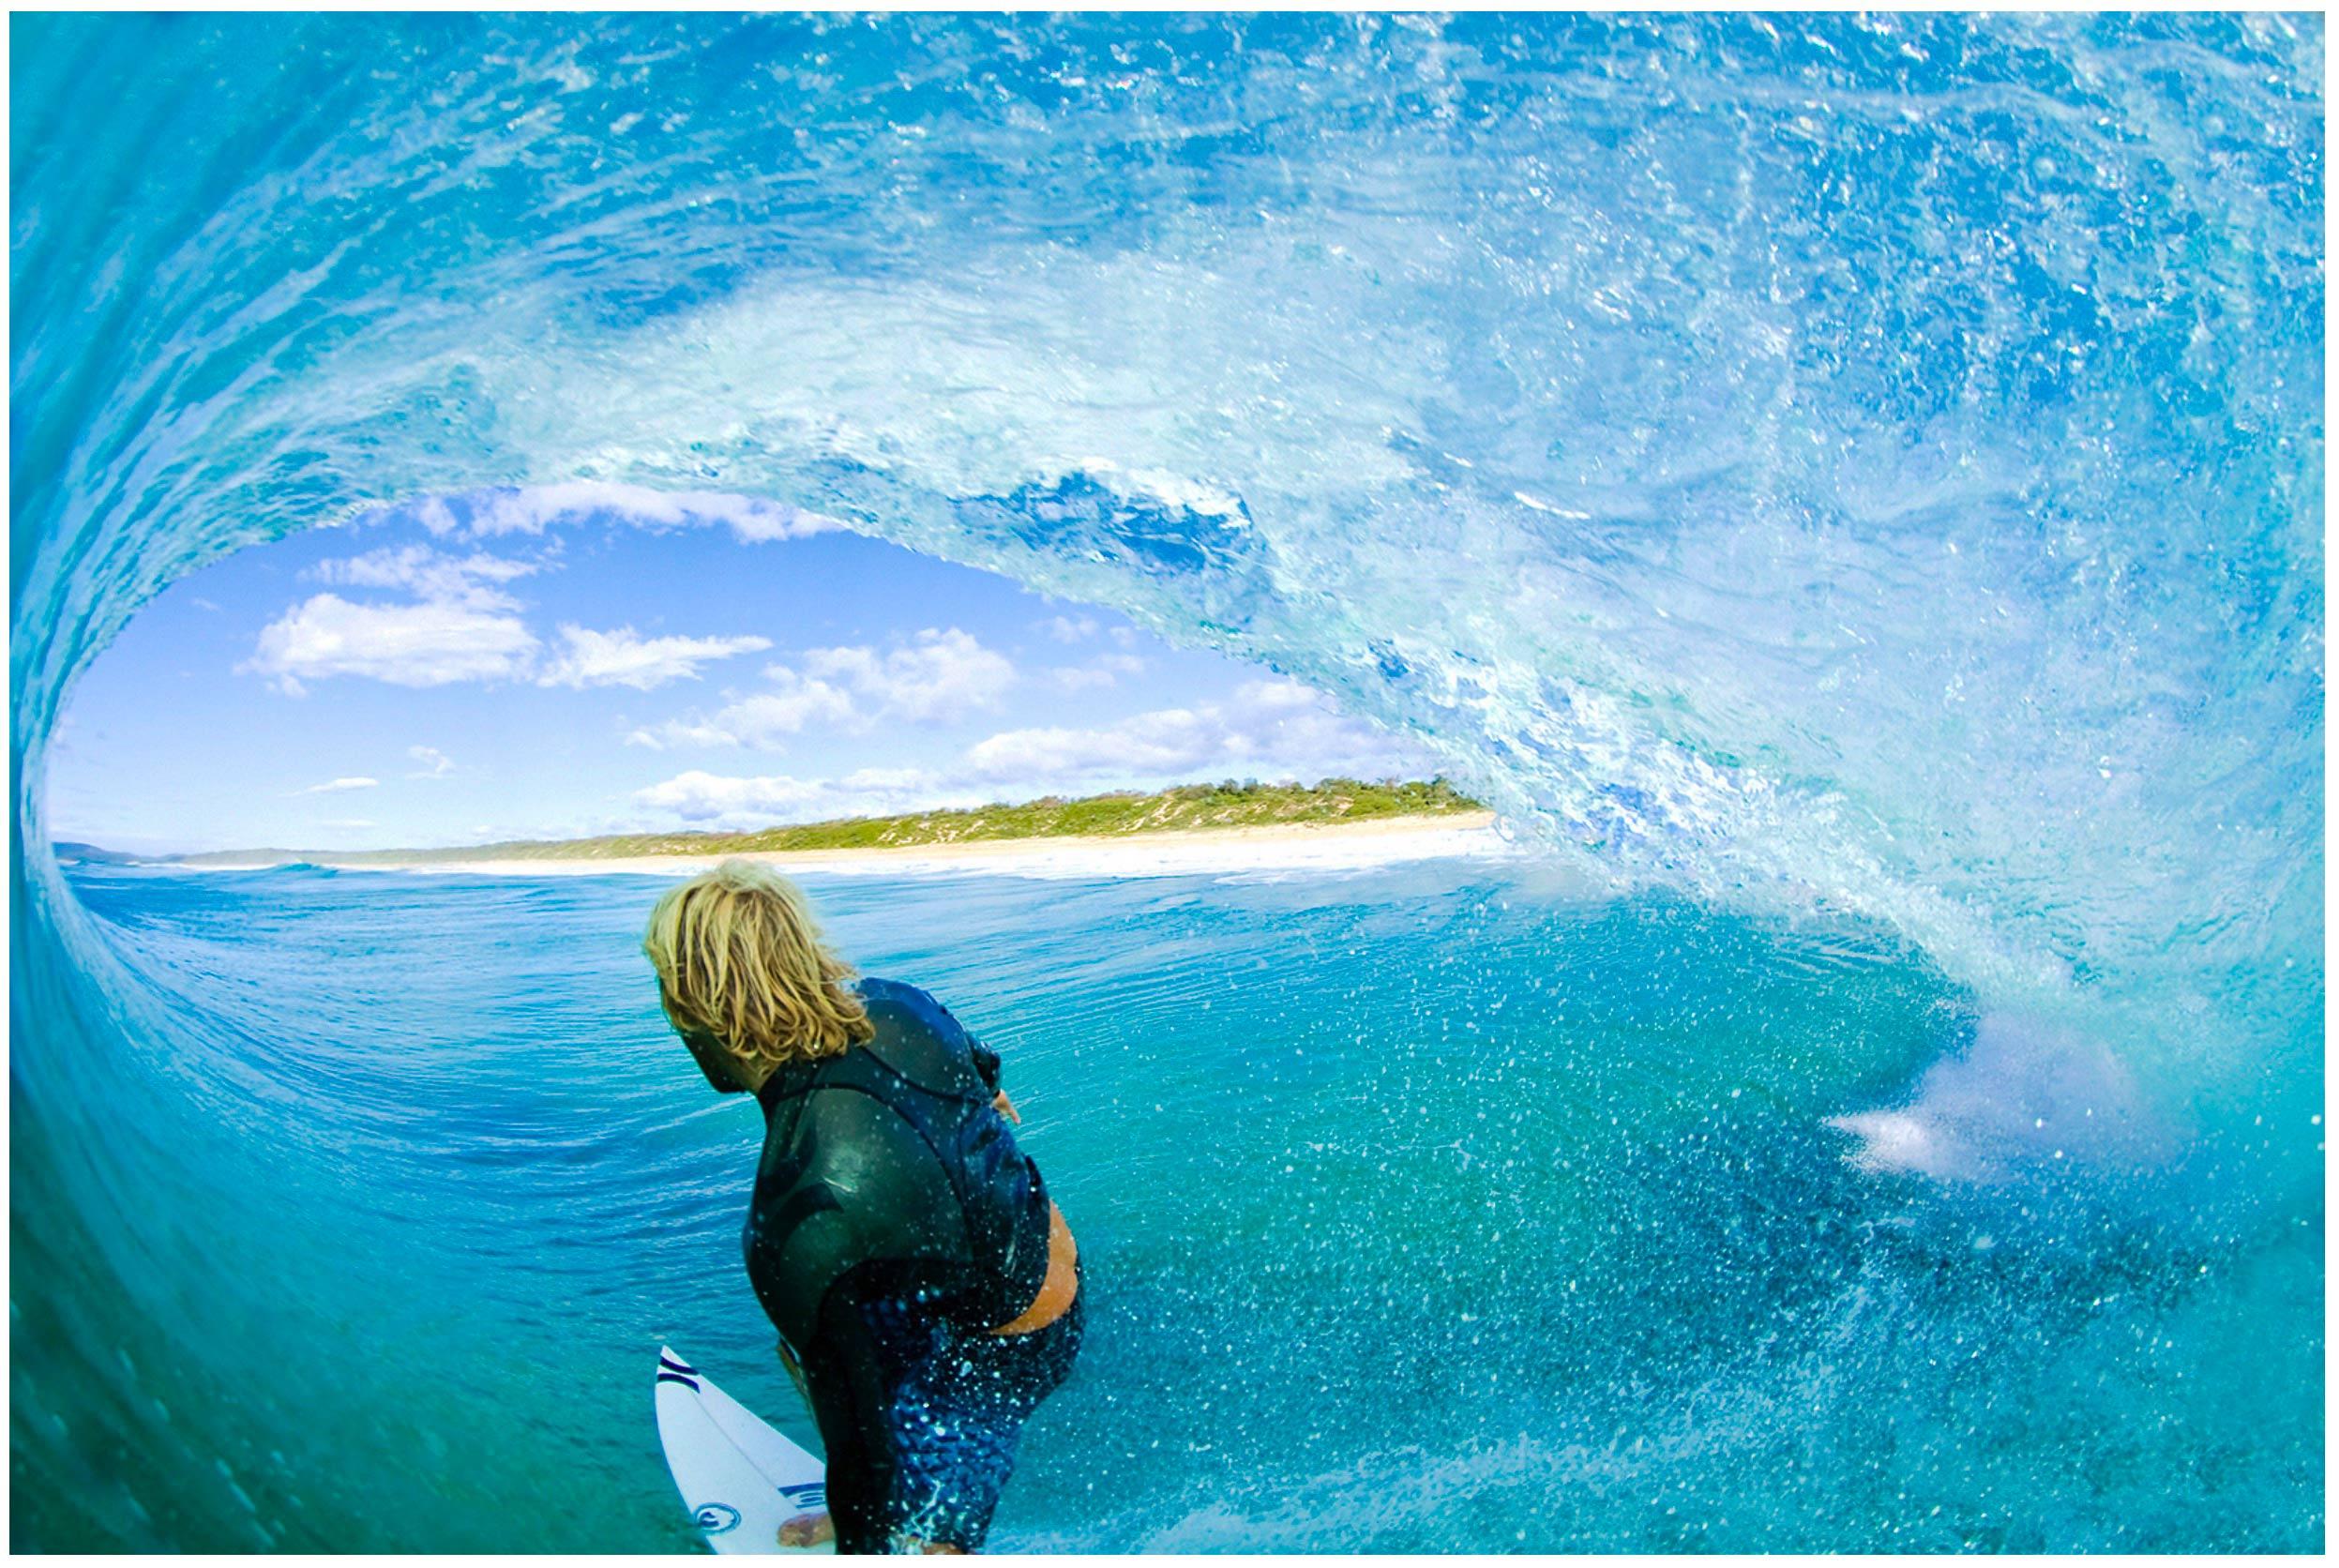 rodd-owen-surf-photography-for-sale-owenphoto-260.jpg